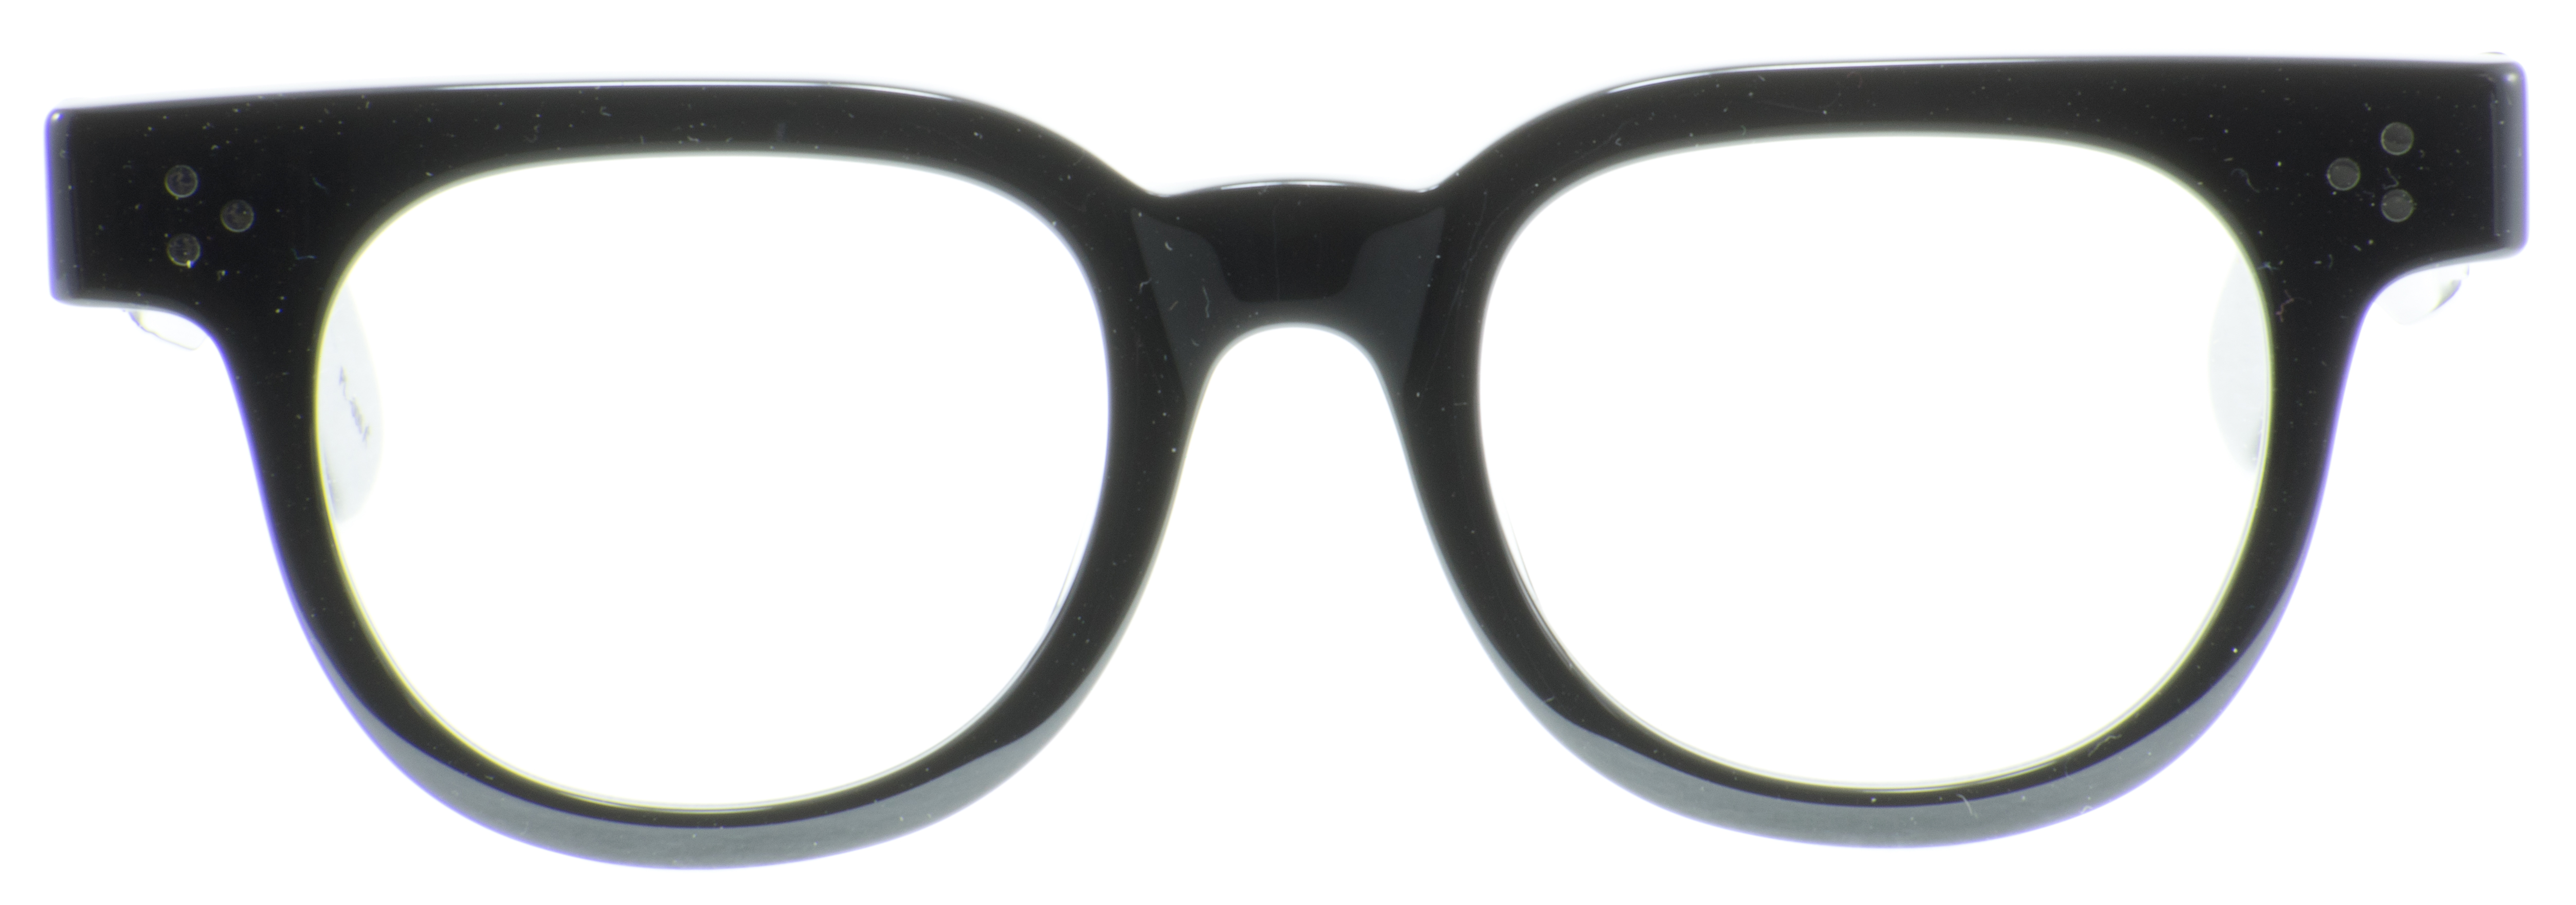 JULIUS TART OPTICAL FDR 48 Black 1360270801